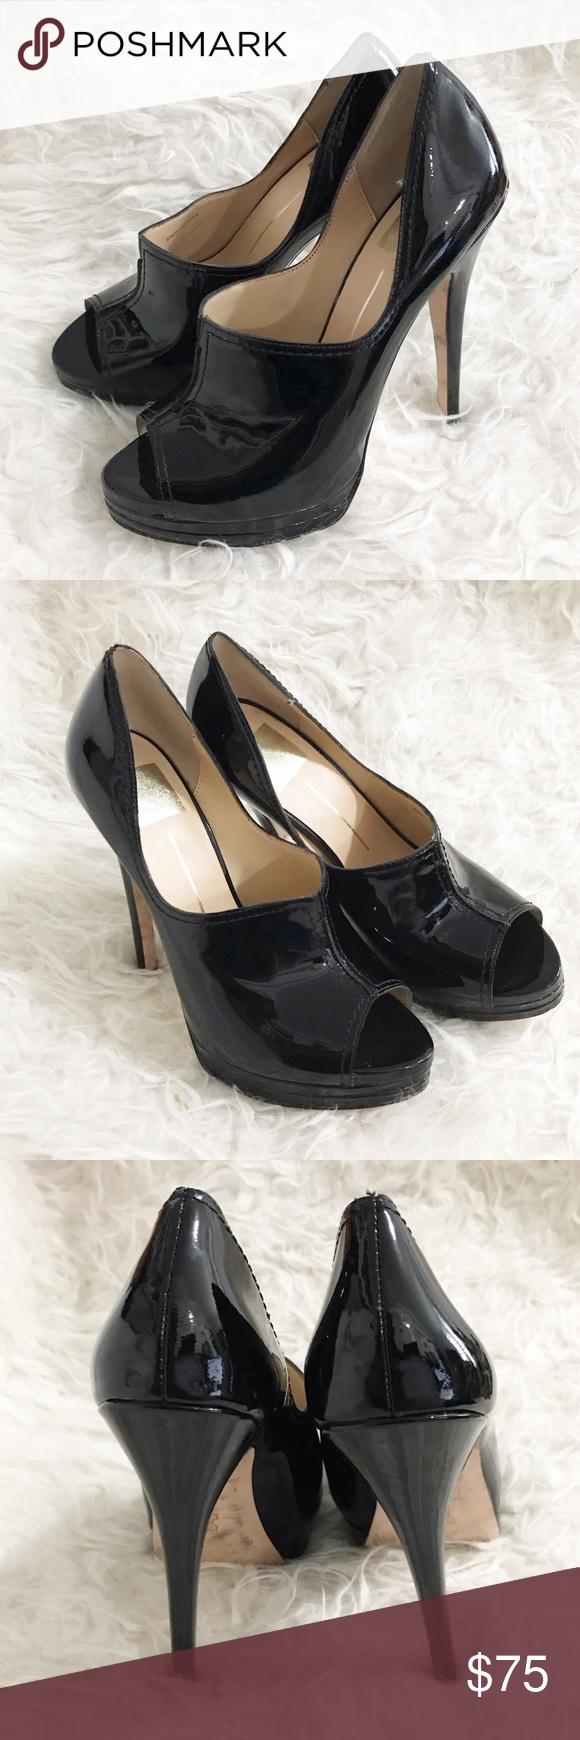 Dolce Vita Super High Heel Peeop Toe Shoes Size 8 Dolce Vita Super High Heel Black Patent Leather Peep Toe On Double Platfor Super High Heels Heels High Heels